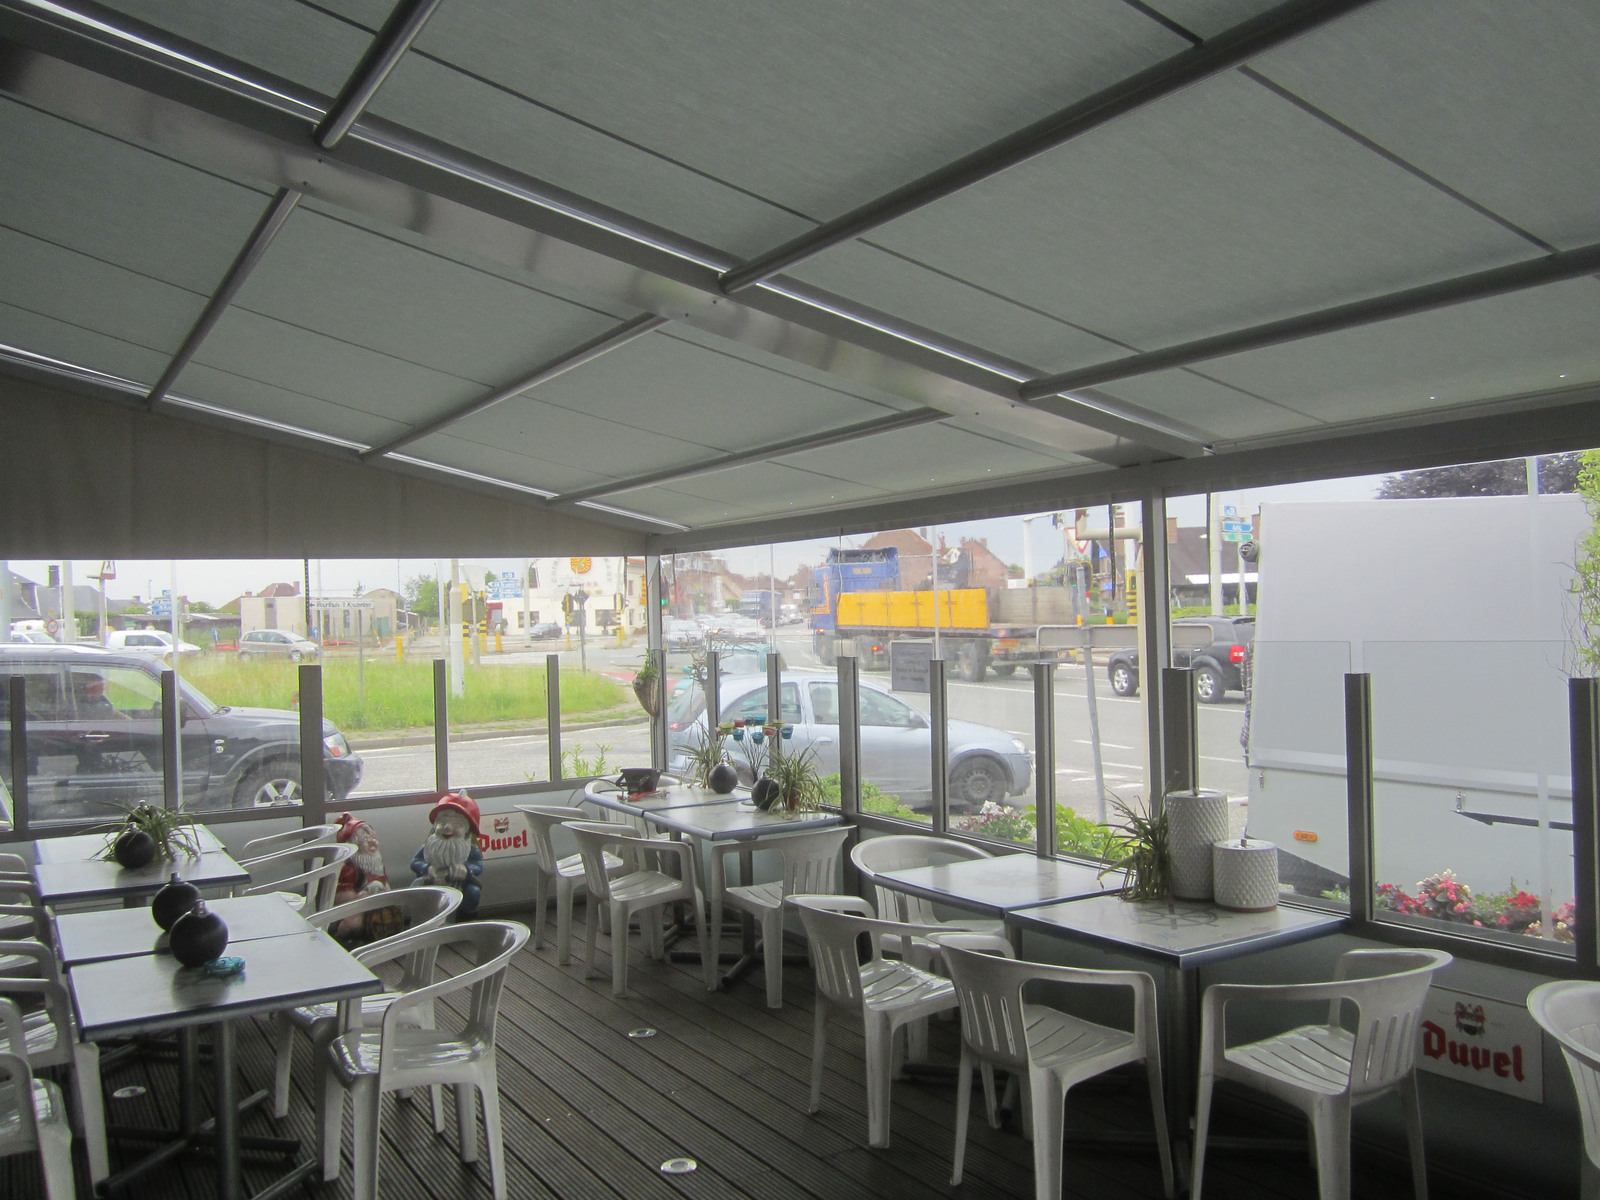 terrassen elektrisch fabulous sonnensegel terrasse warendorf hoetmar terrassen elektrisch with. Black Bedroom Furniture Sets. Home Design Ideas